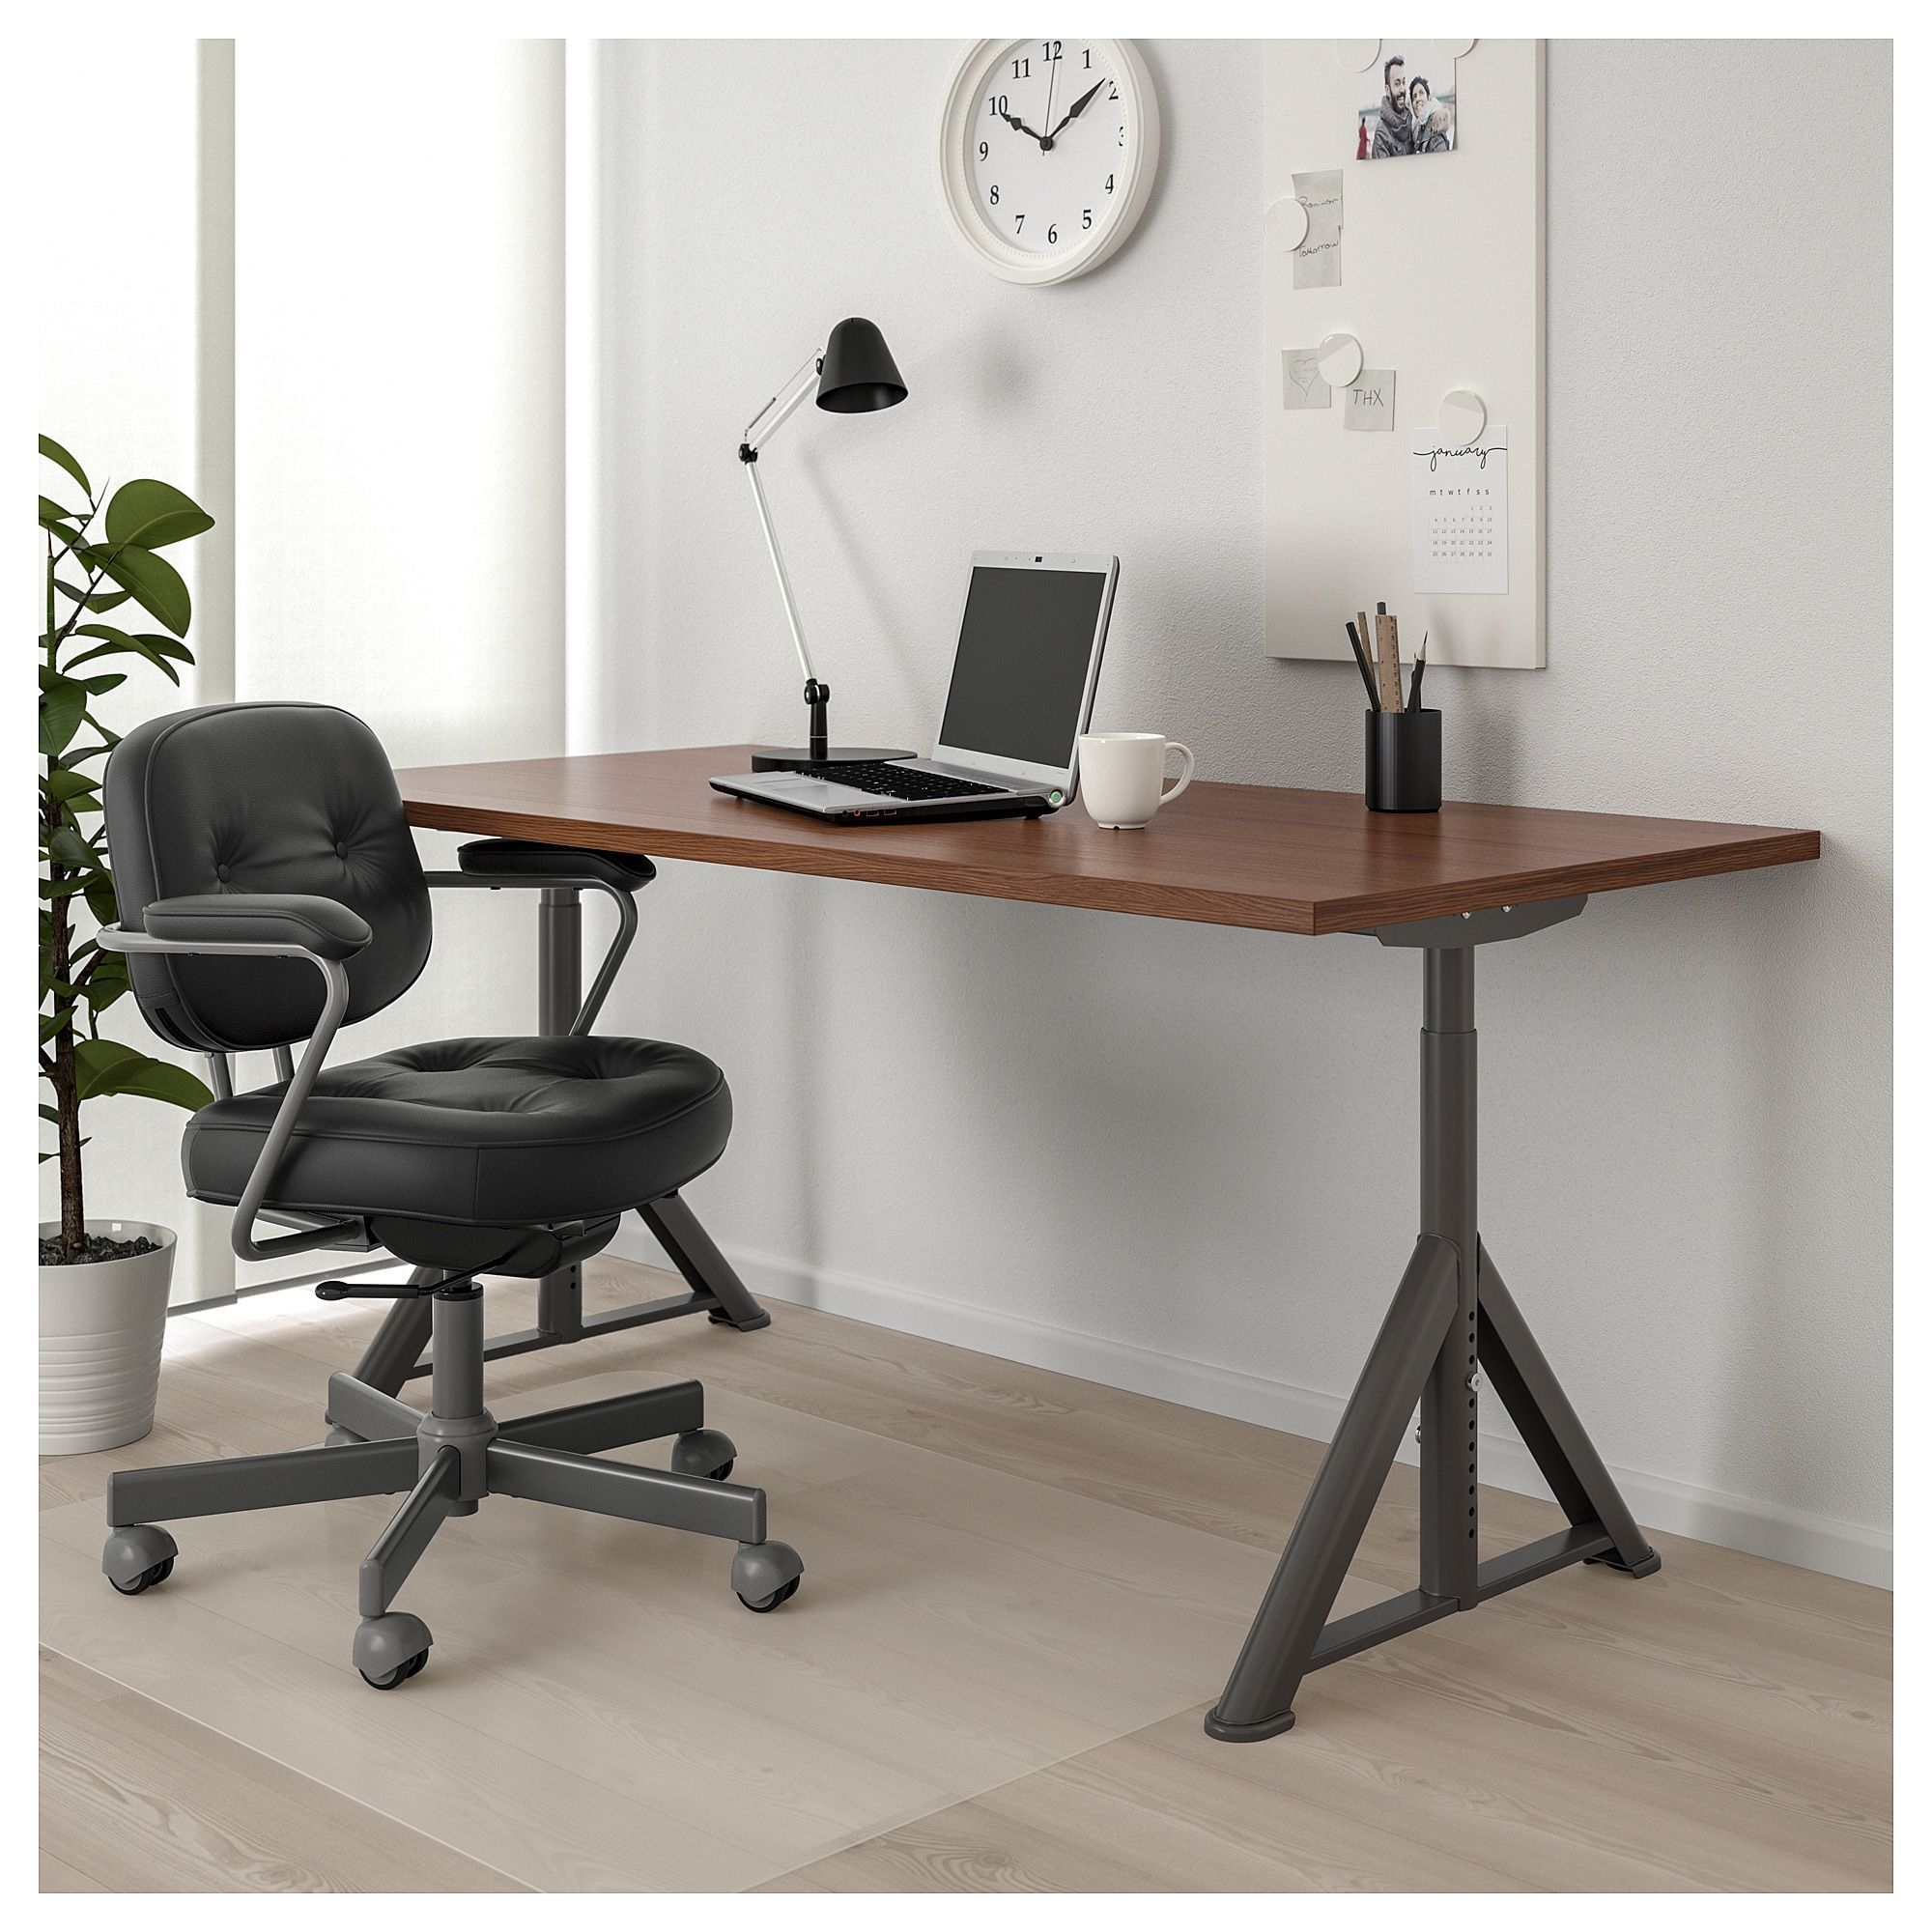 IKEA IDÅSEN Desk brown, dark gray (With images) Black